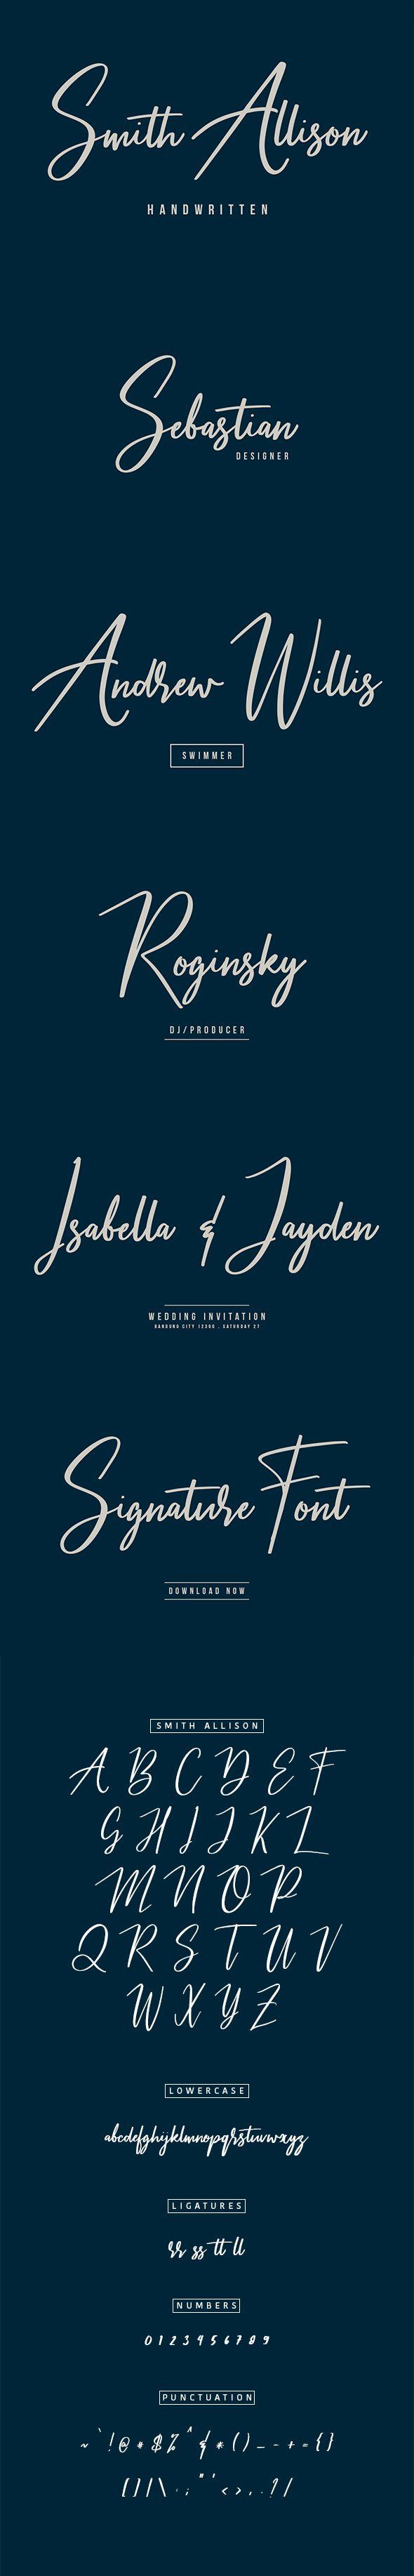 Smith Allison Signature Font - Calligraphy Script